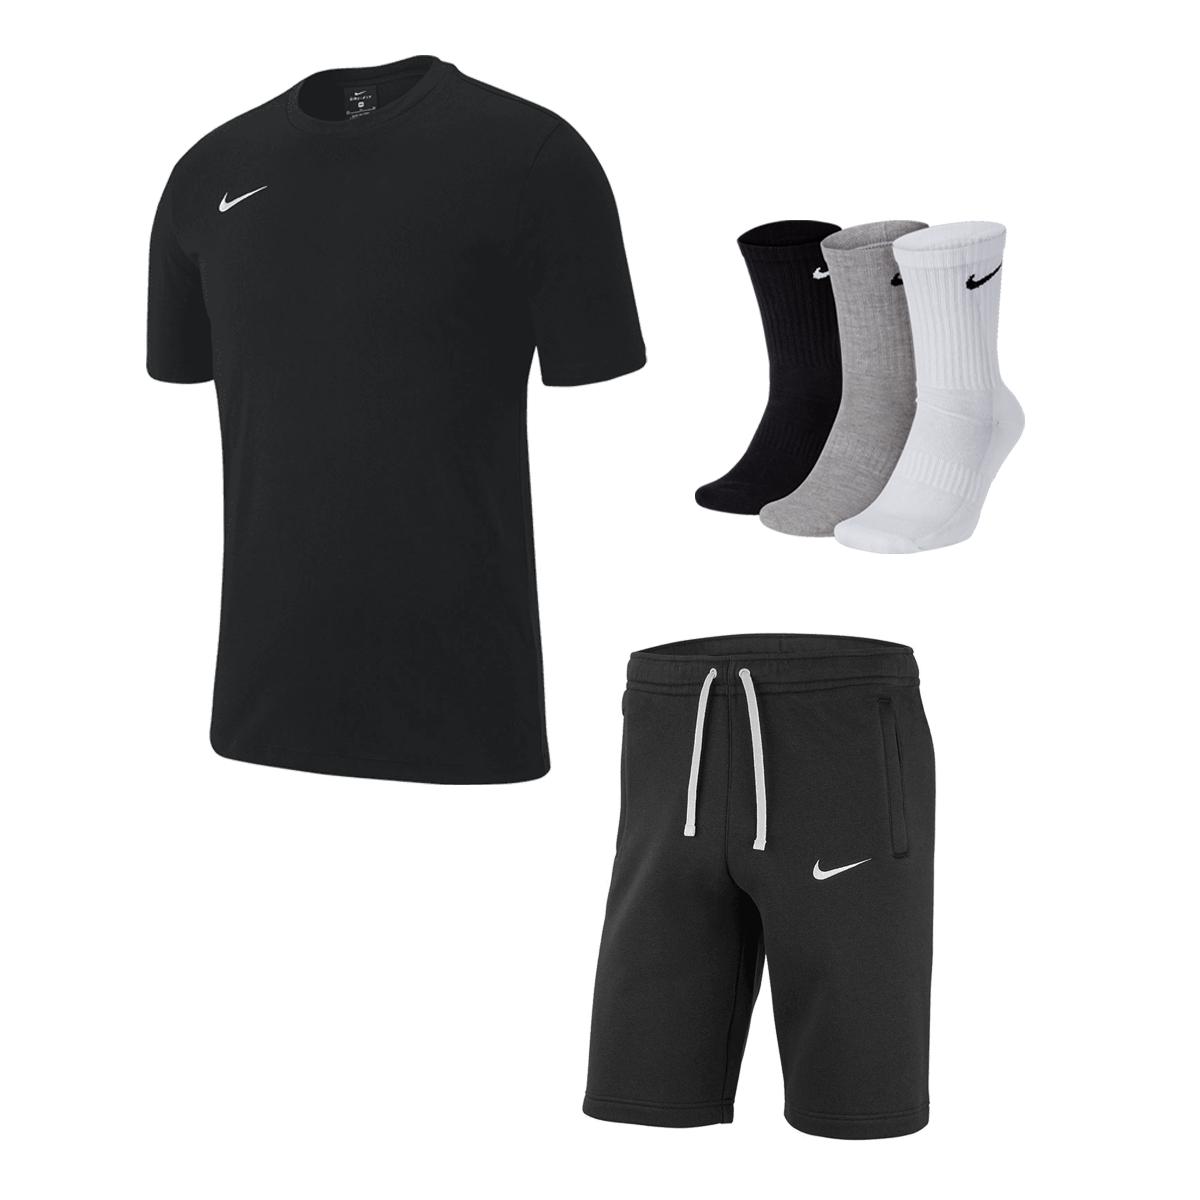 Nike Club 19 Outfit (Shirt, Shorts, 3x Socken) - Farben frei wählbar